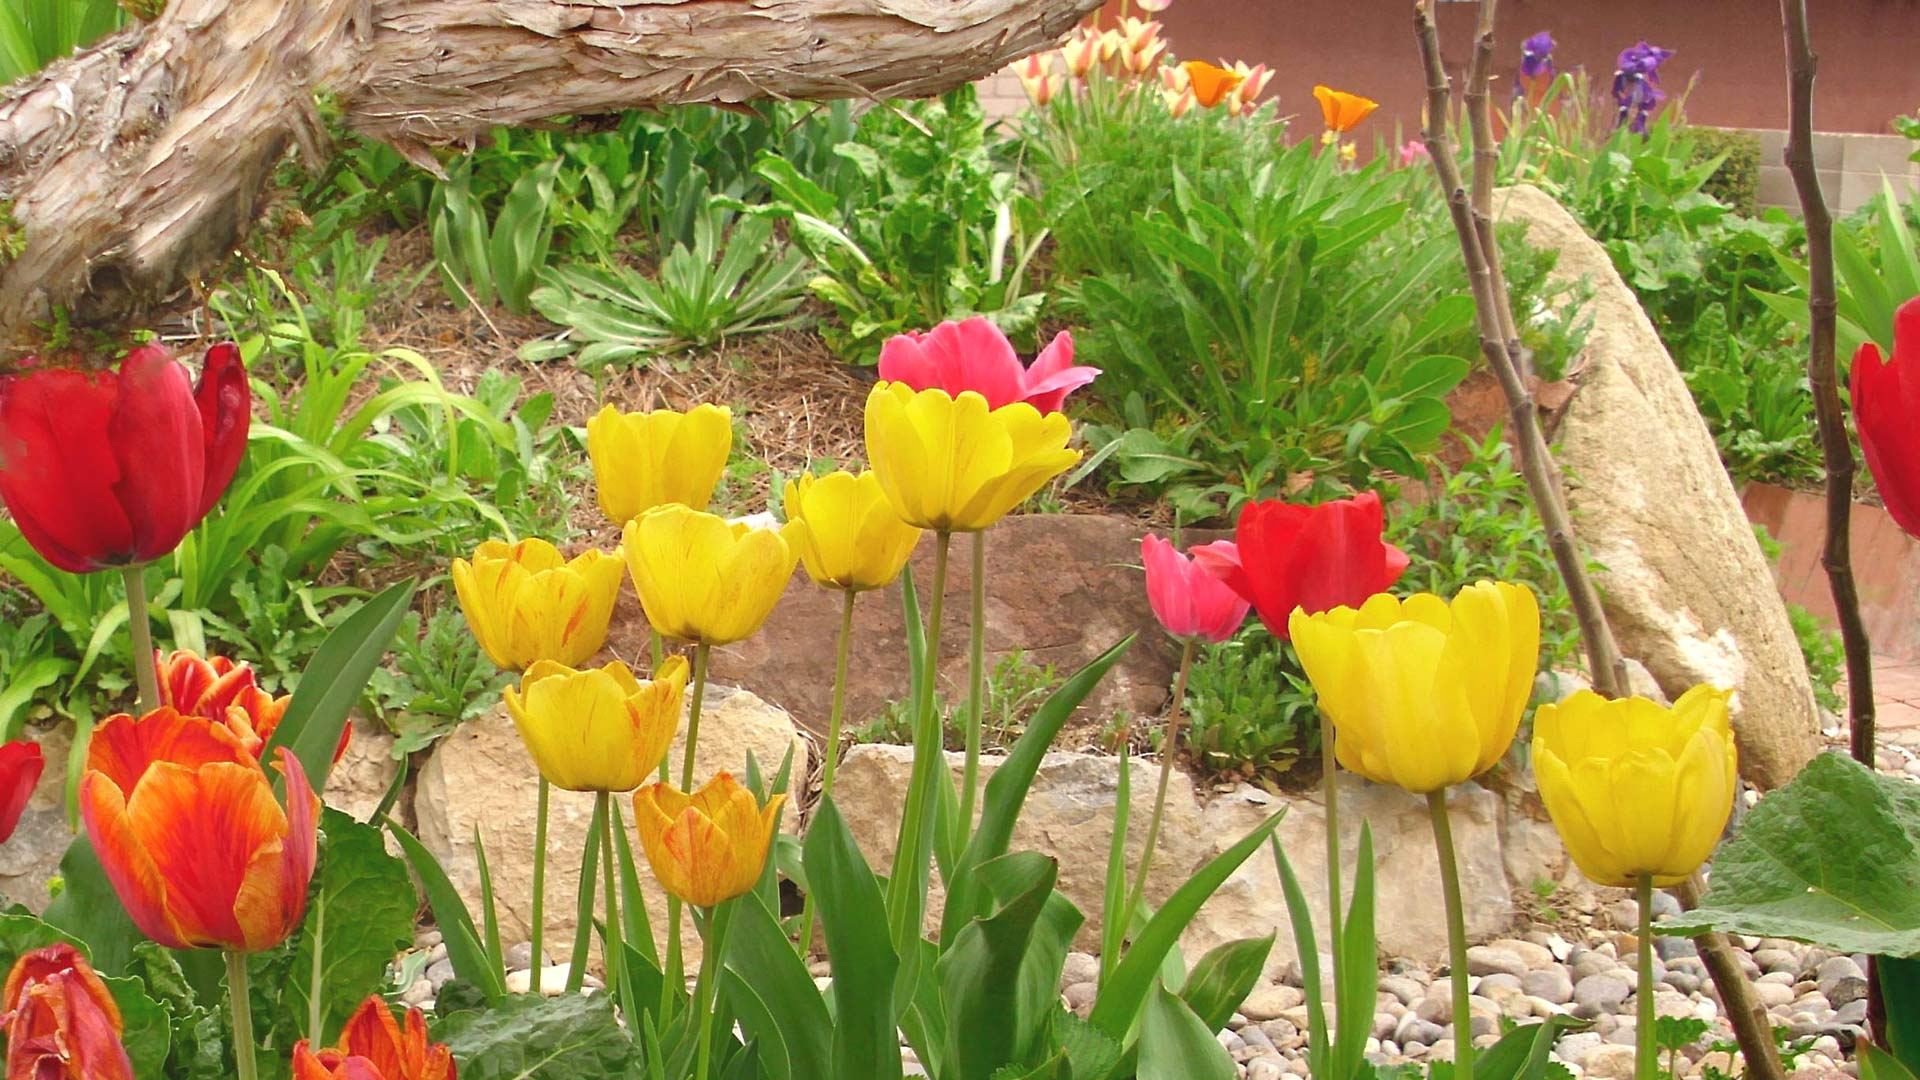 spring flowers screensavers - photo #13